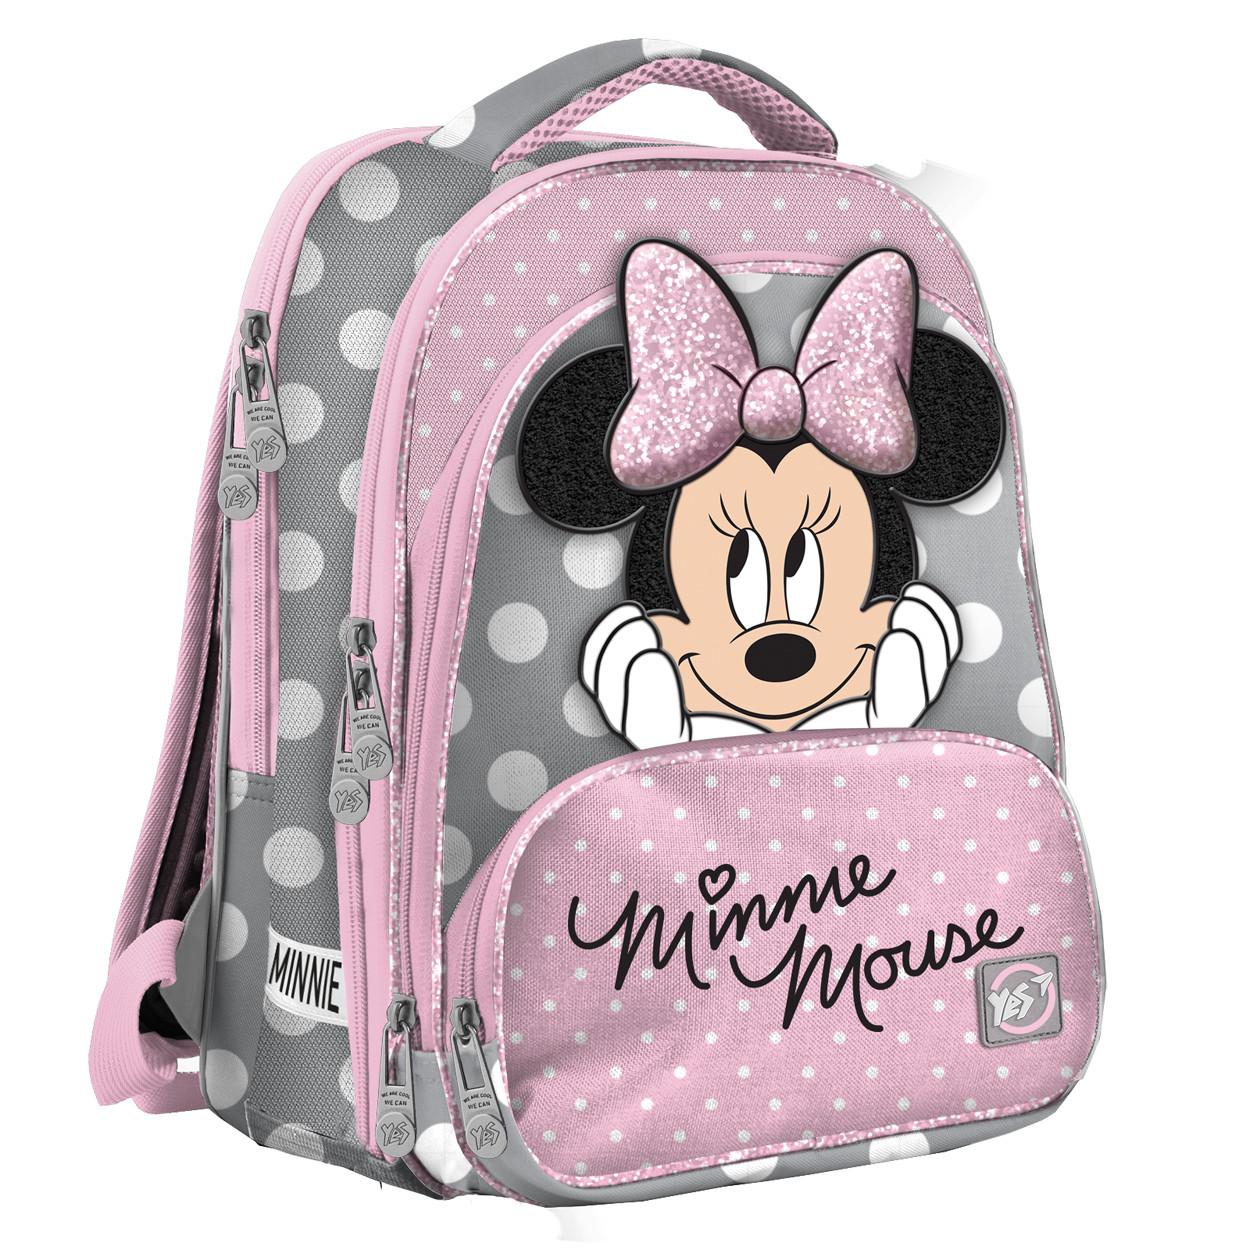 Рюкзак школьный Yes S-30 JUNO ULTRA Minnie Mouse код:558156